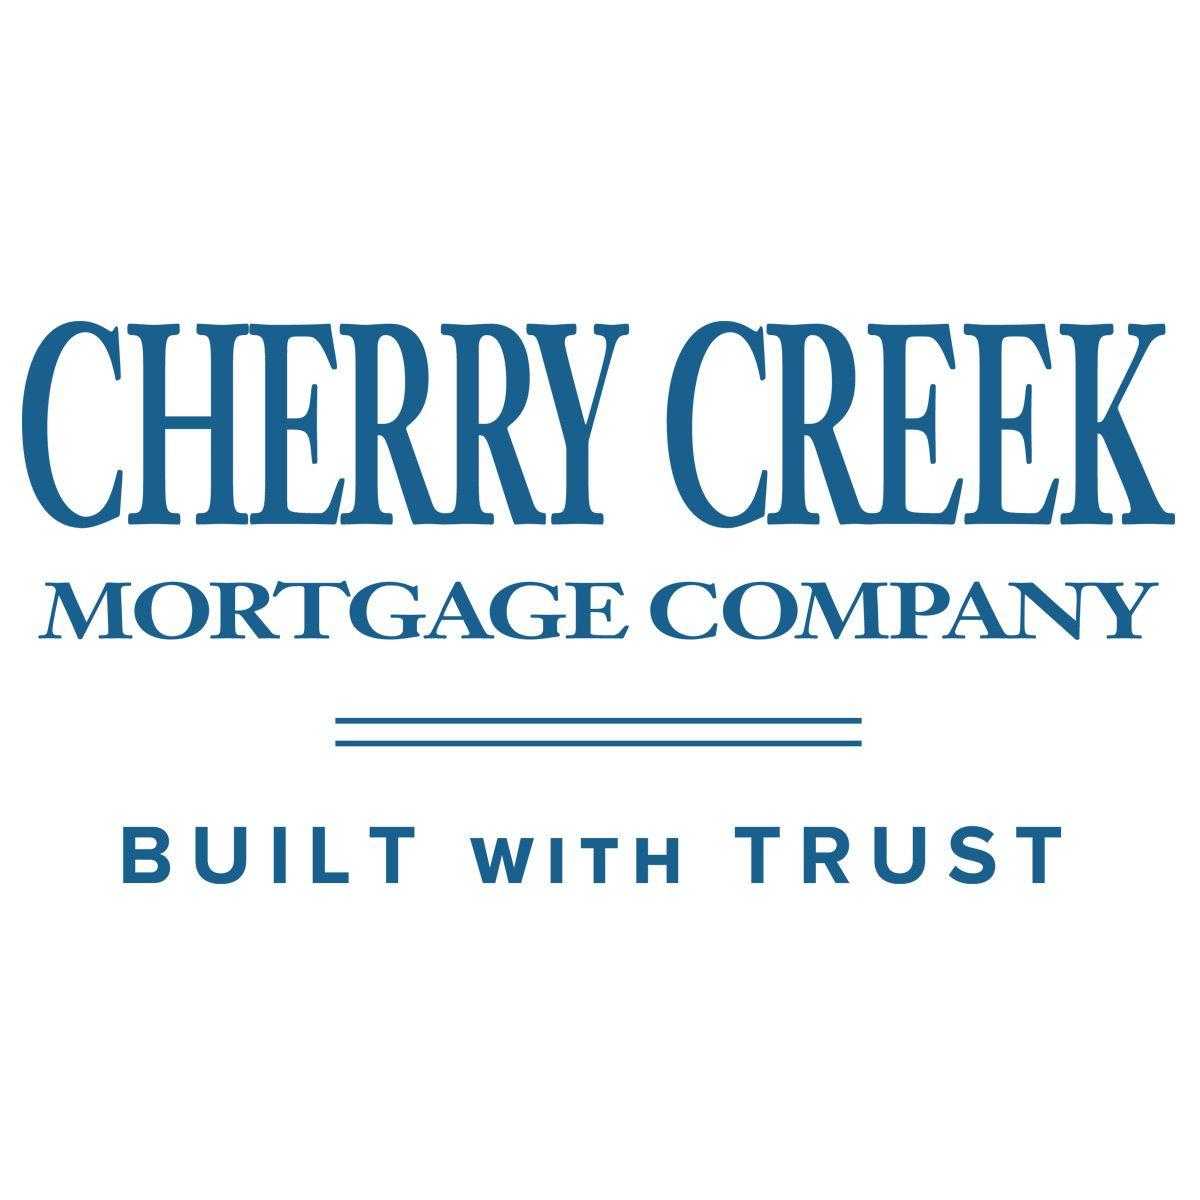 Cherry Creek Mortgage Company - Fox Cities